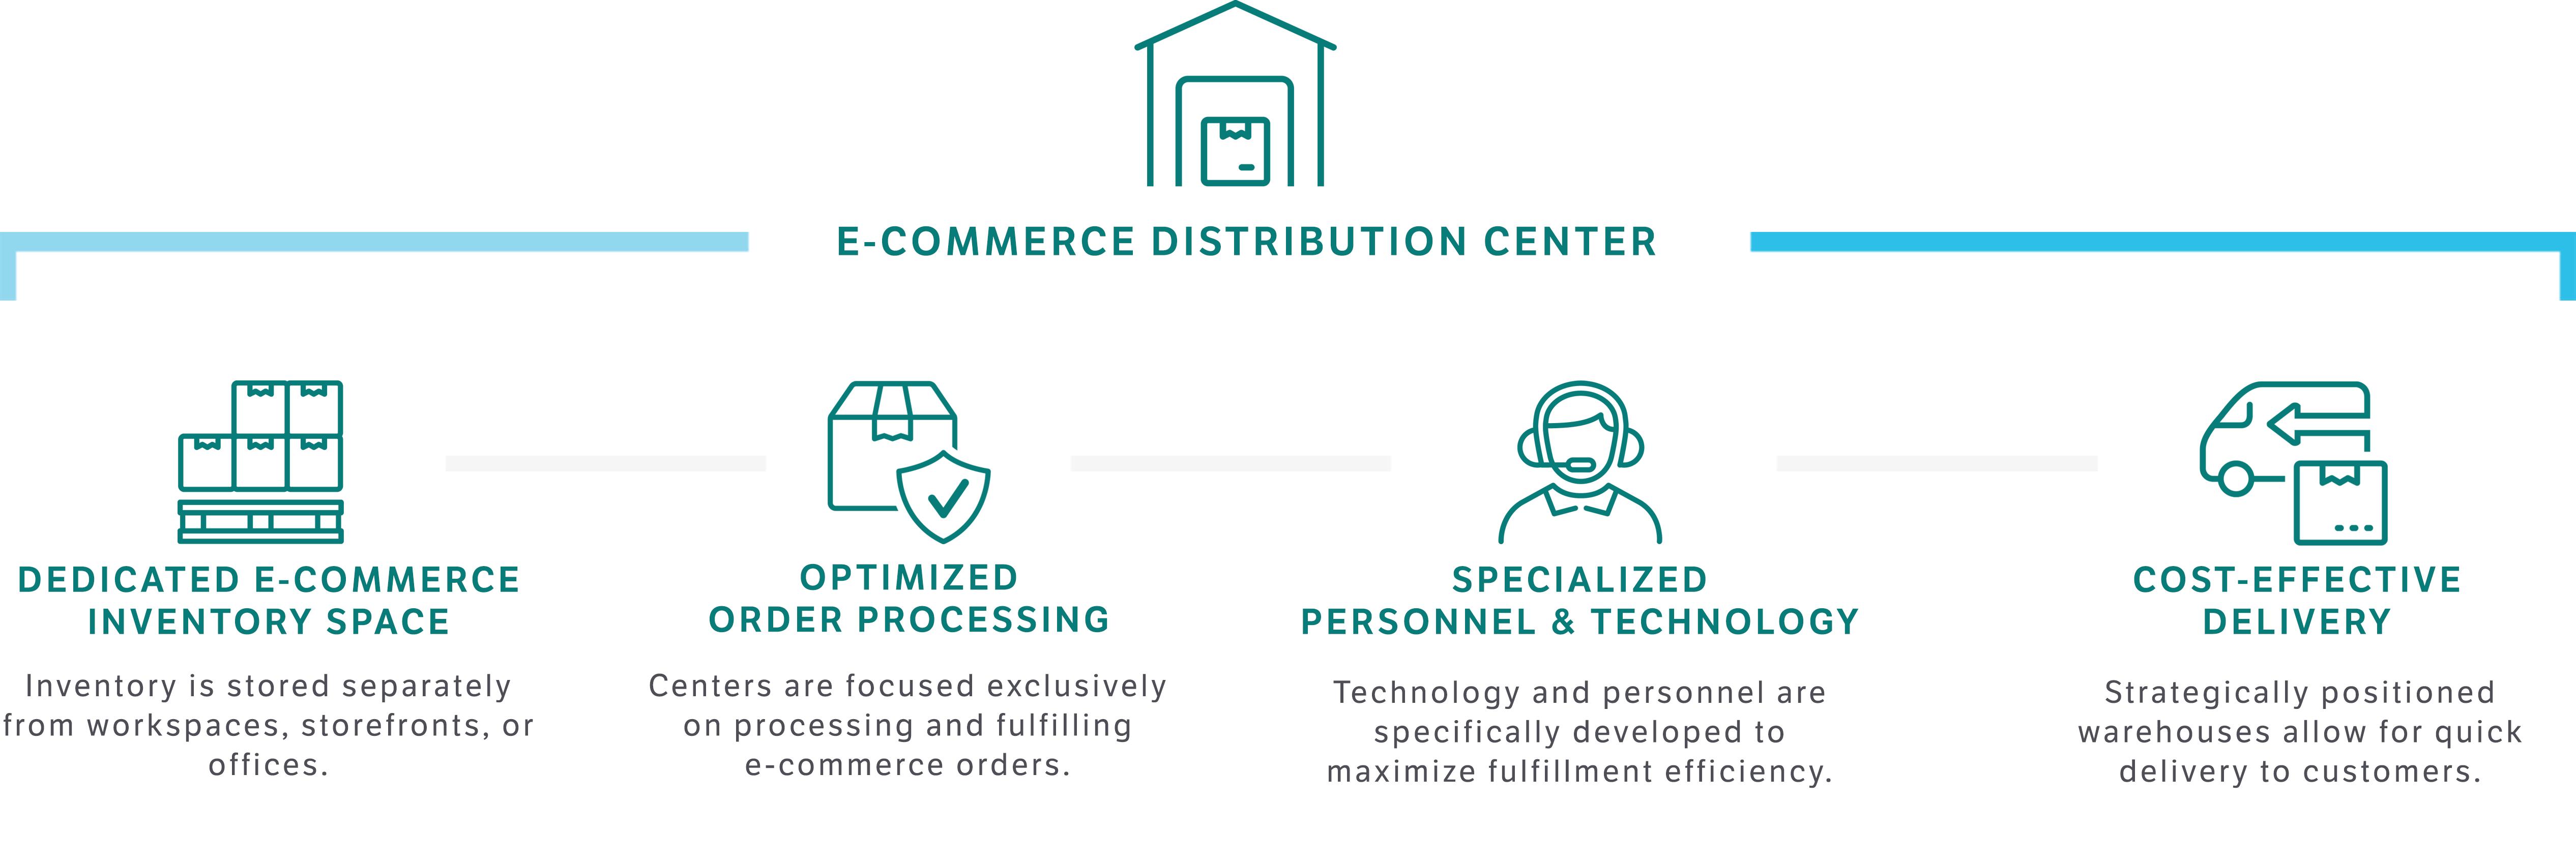 Why e-commerce fulfillment centers are so effective